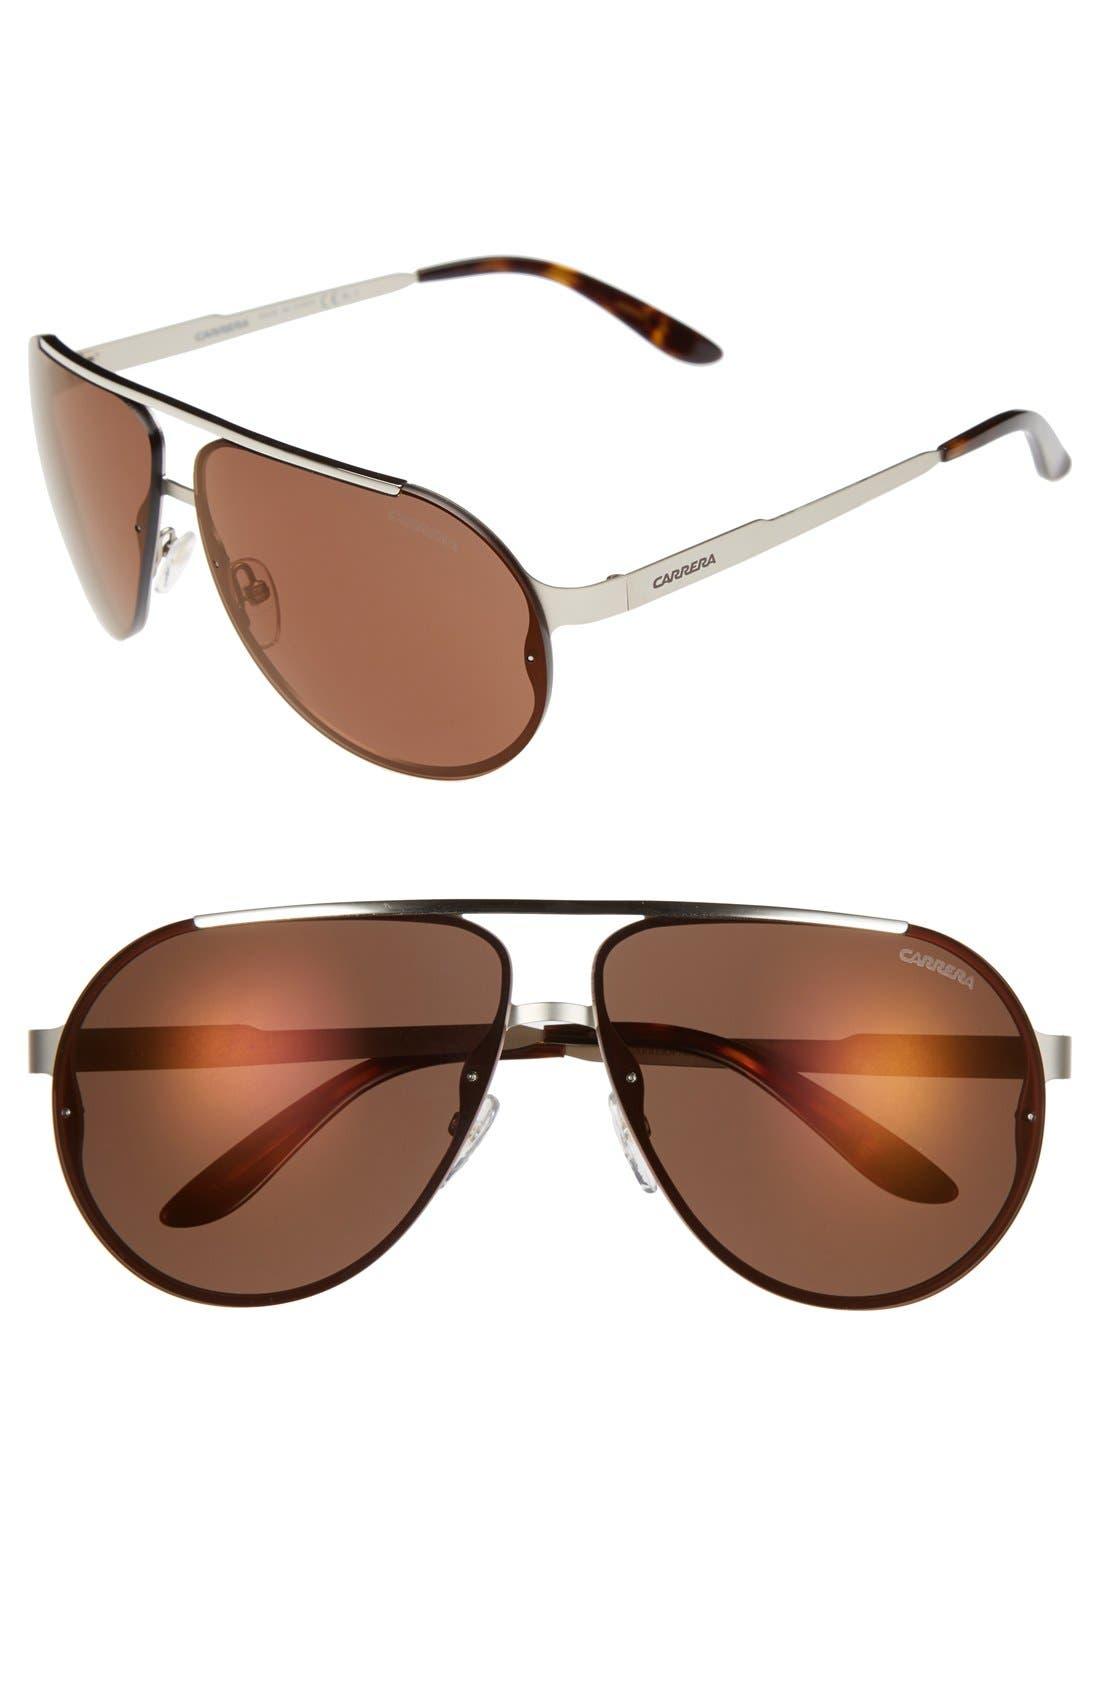 65mm Aviator Sunglasses,                             Main thumbnail 1, color,